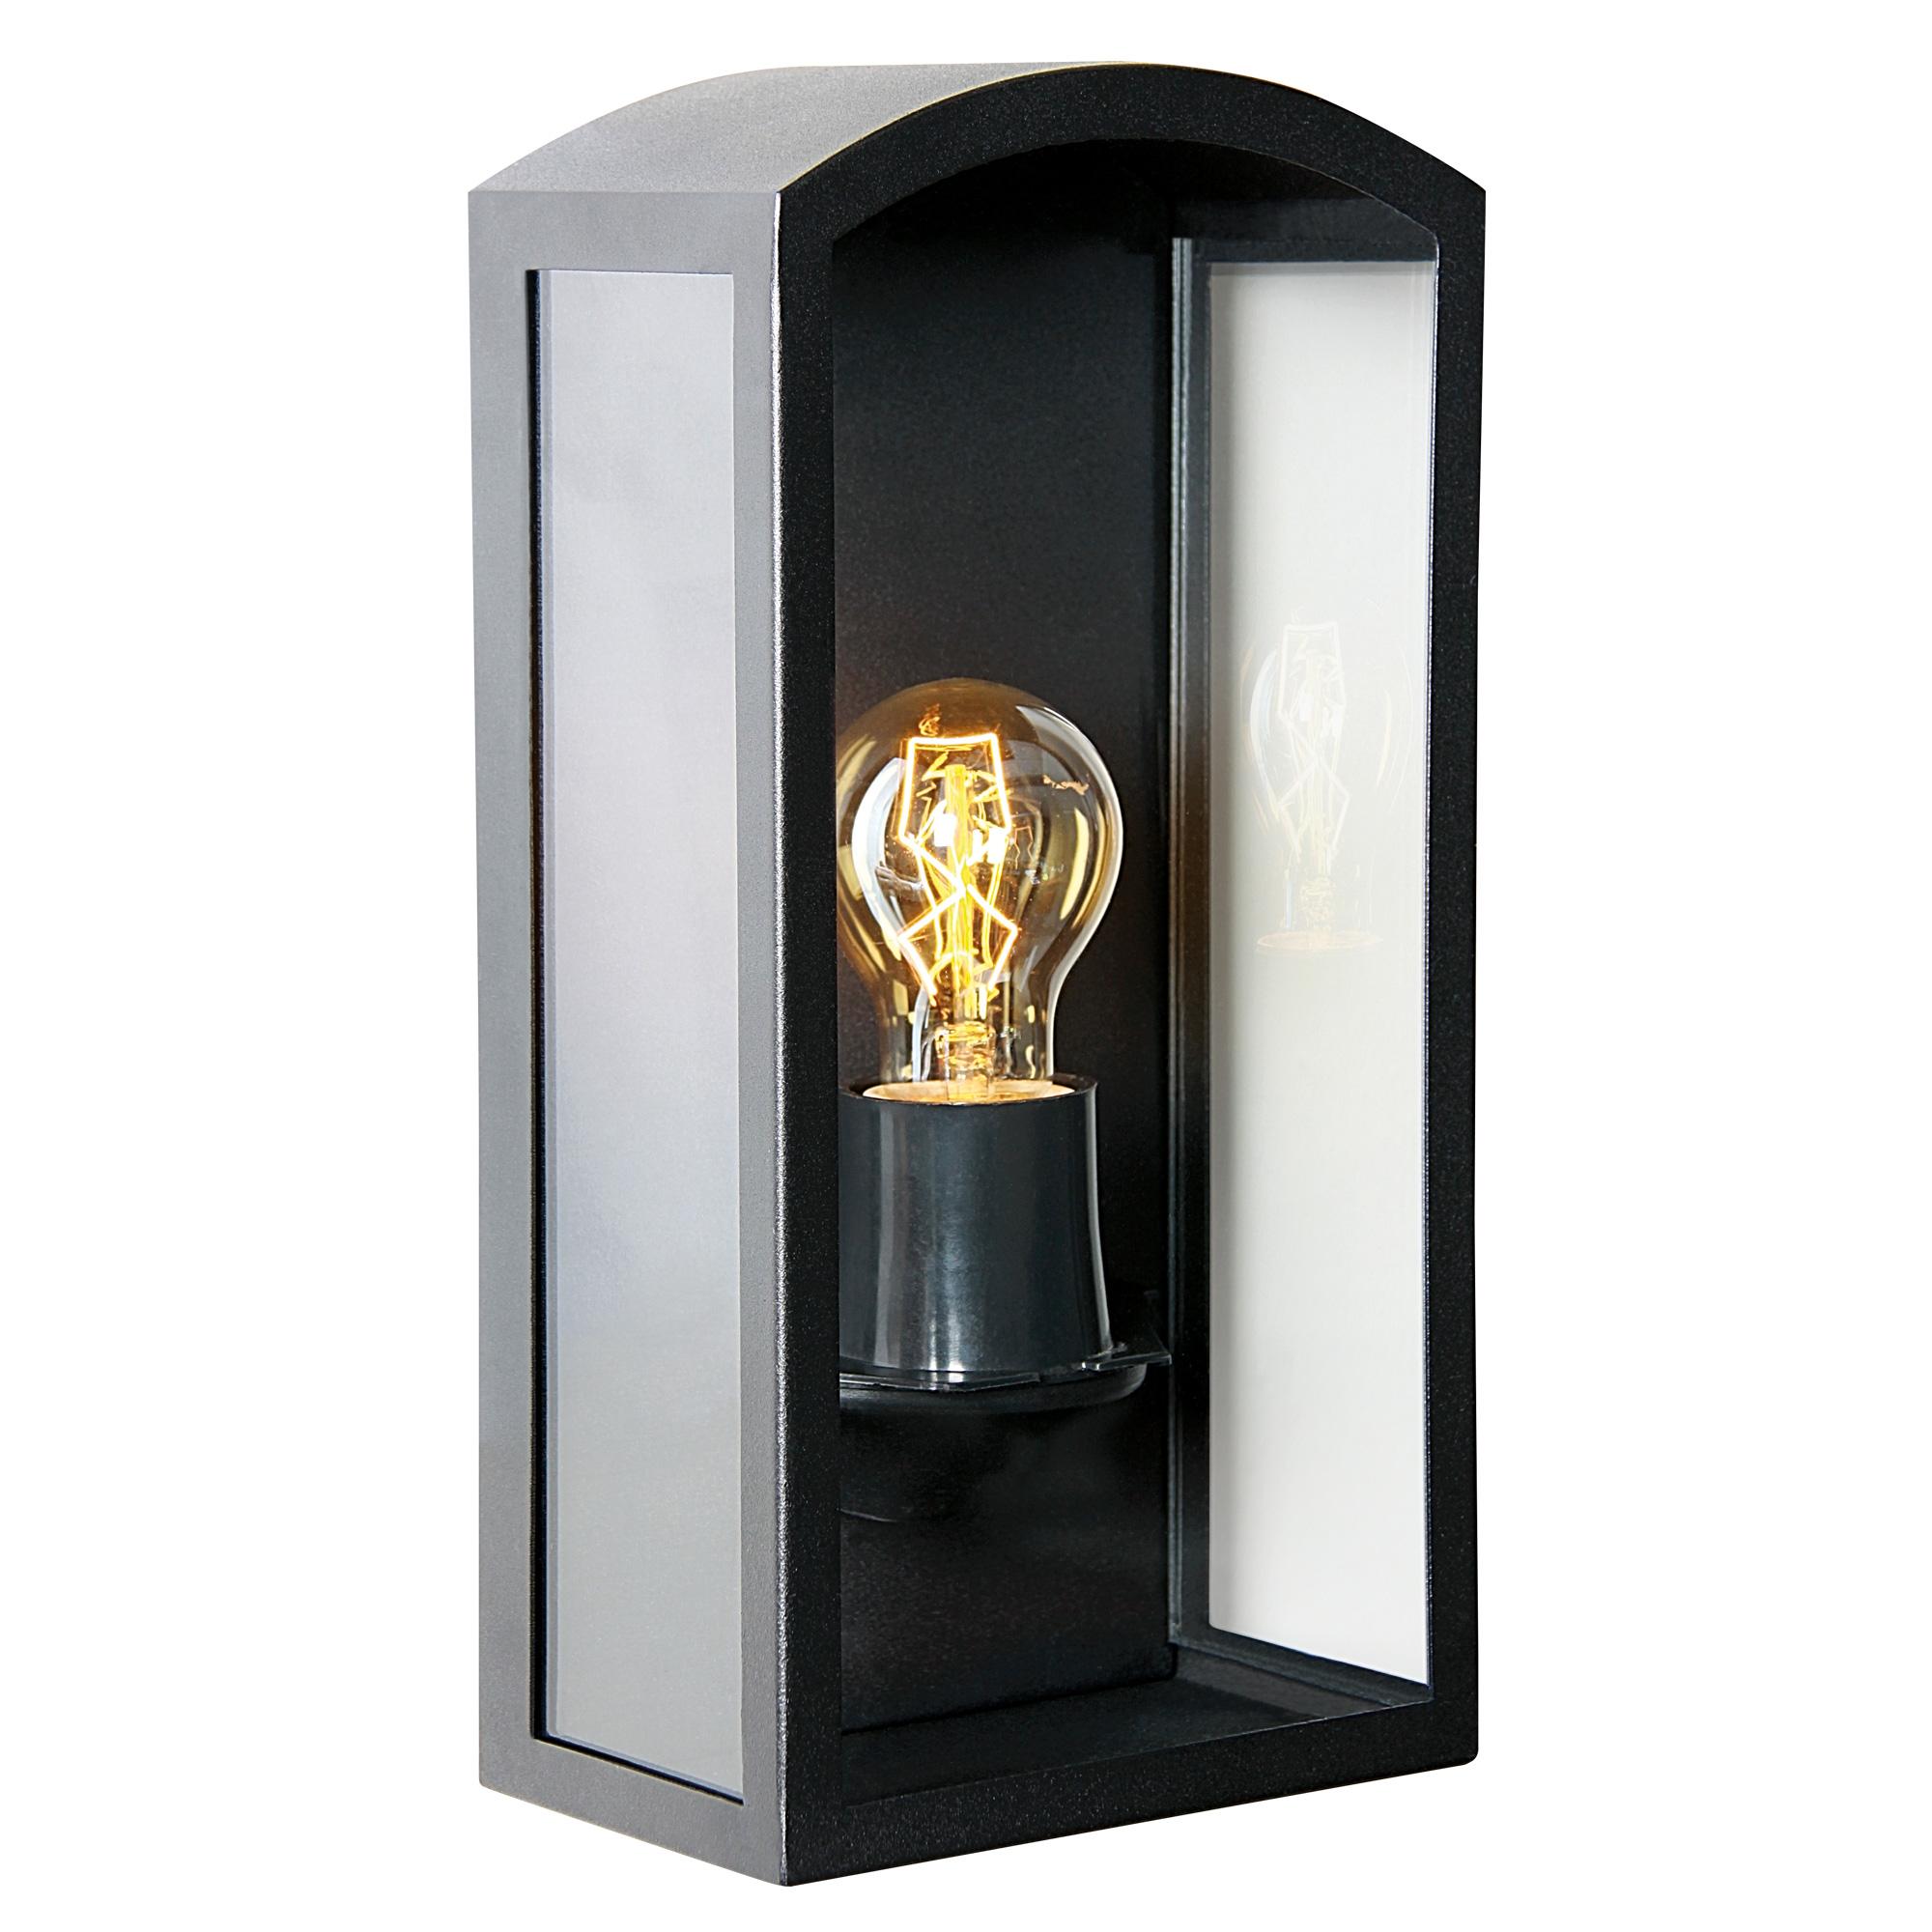 Buitenlamp Como Zwart Wandlamp Plat